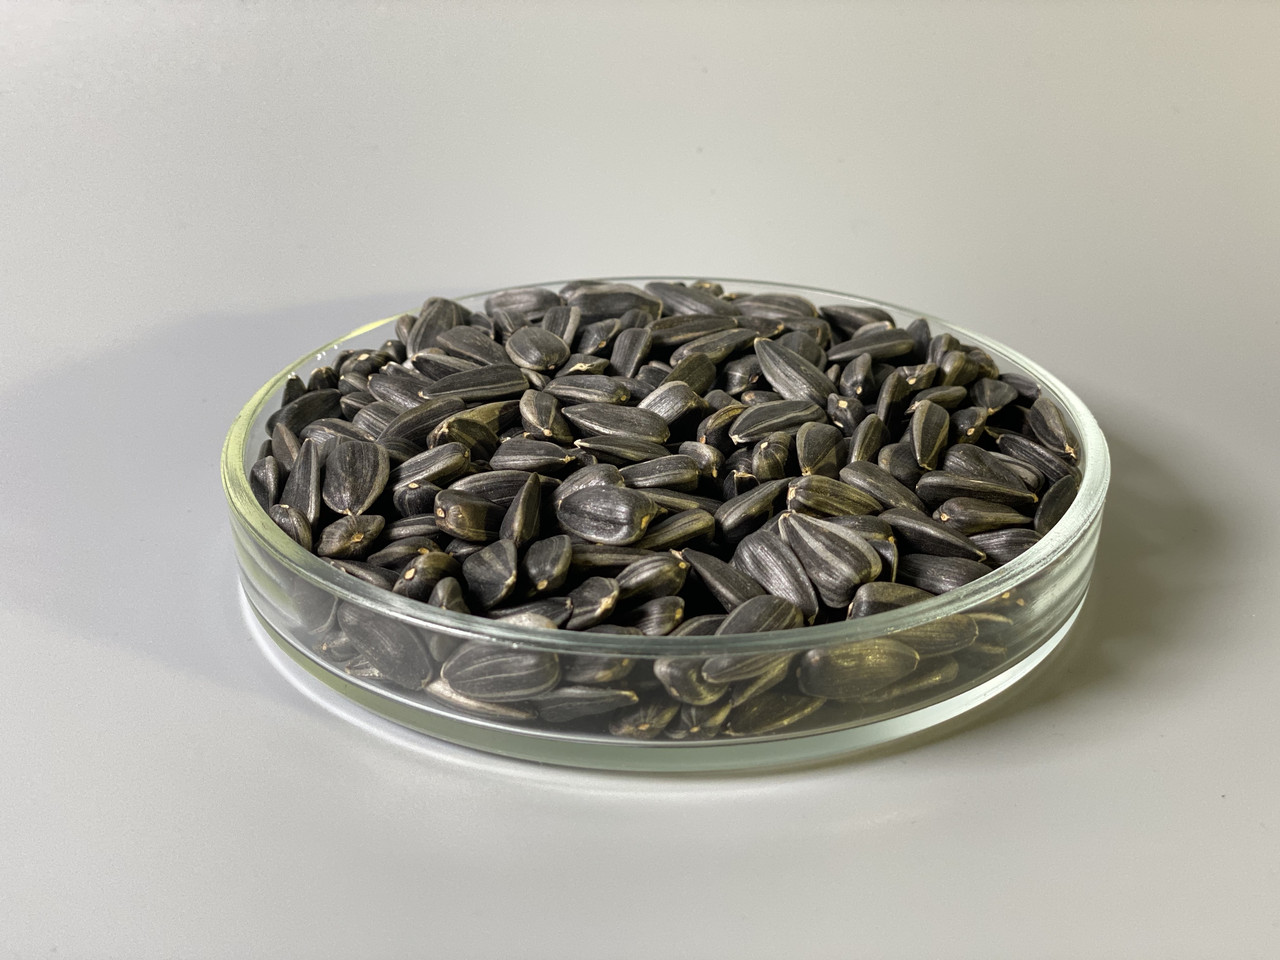 Подсолнечник семена микрогрин экосемена microgreens seeds  non gmo certified Вес 1 кг